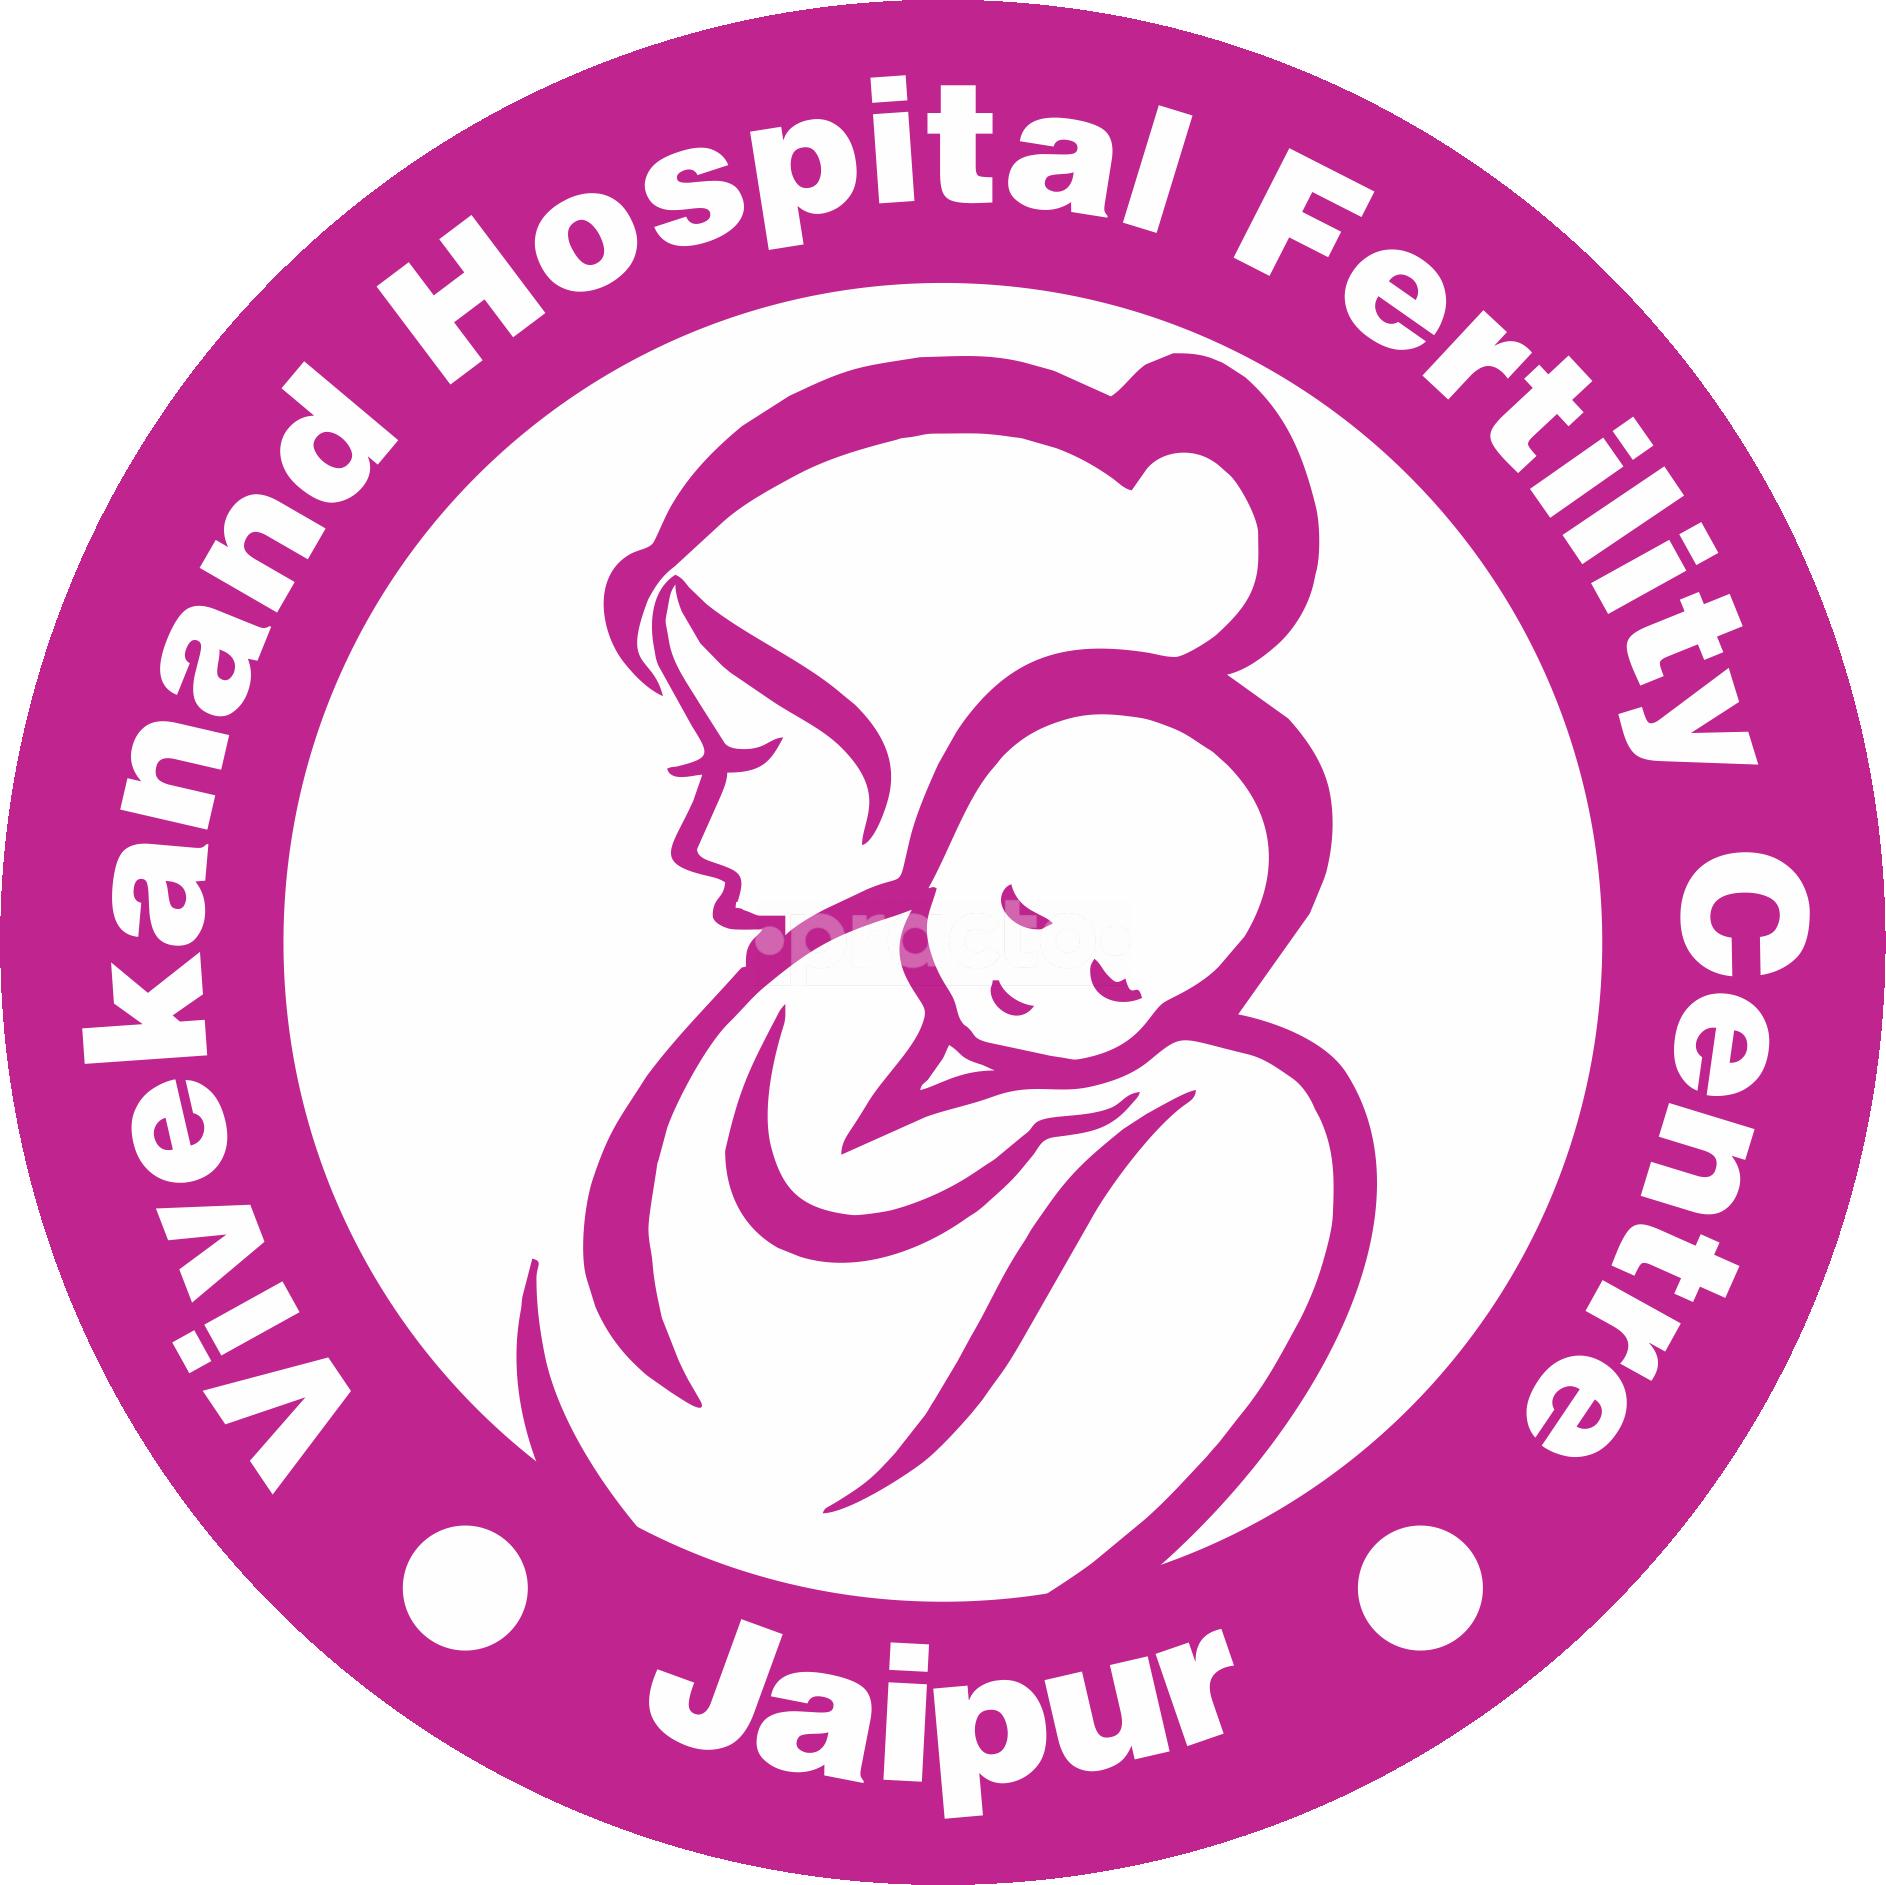 Vivekanand Hospital and Fertility Centre